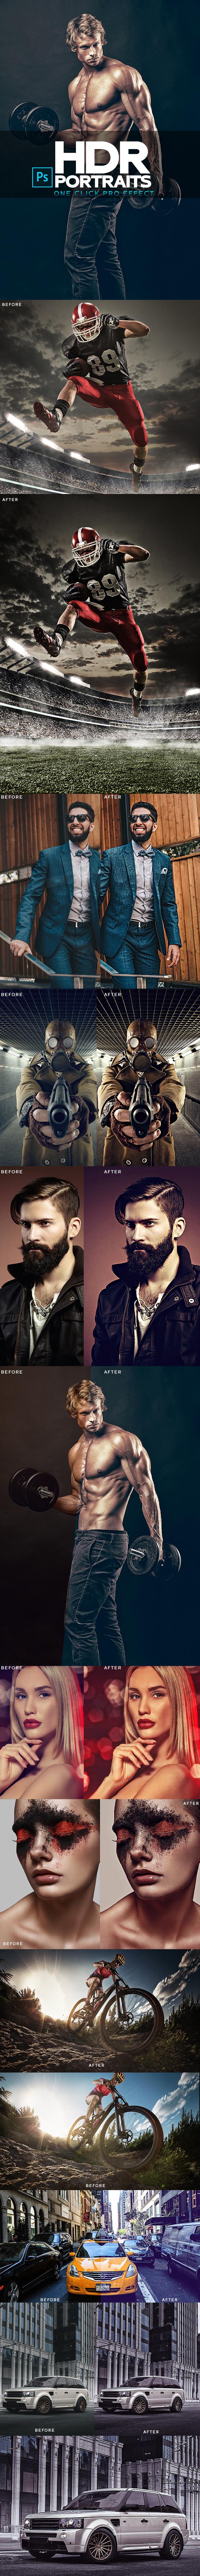 HDR Portrait Photoshop Action - Photo Effects Actions